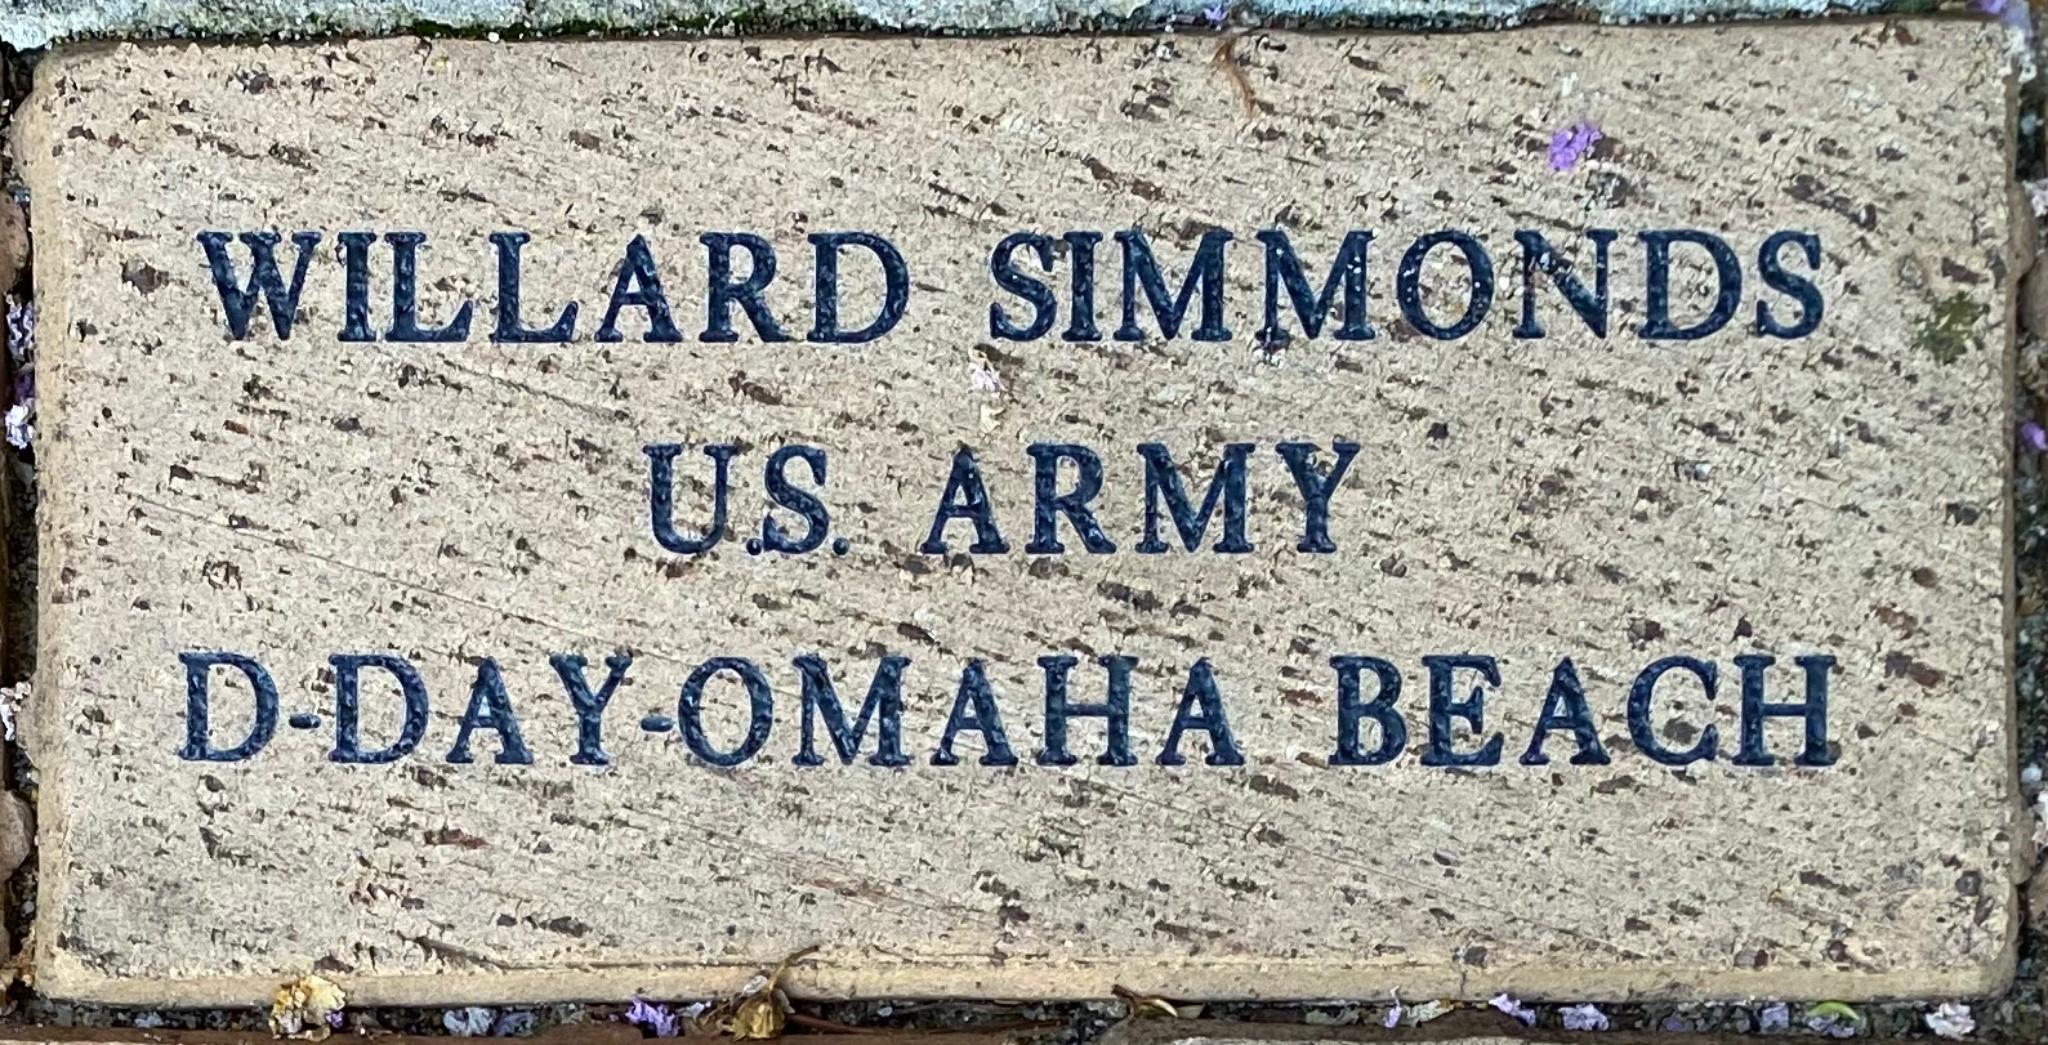 WILLARD SIMMONDS U.S. ARMY D-DAY-OMAHA BEACH